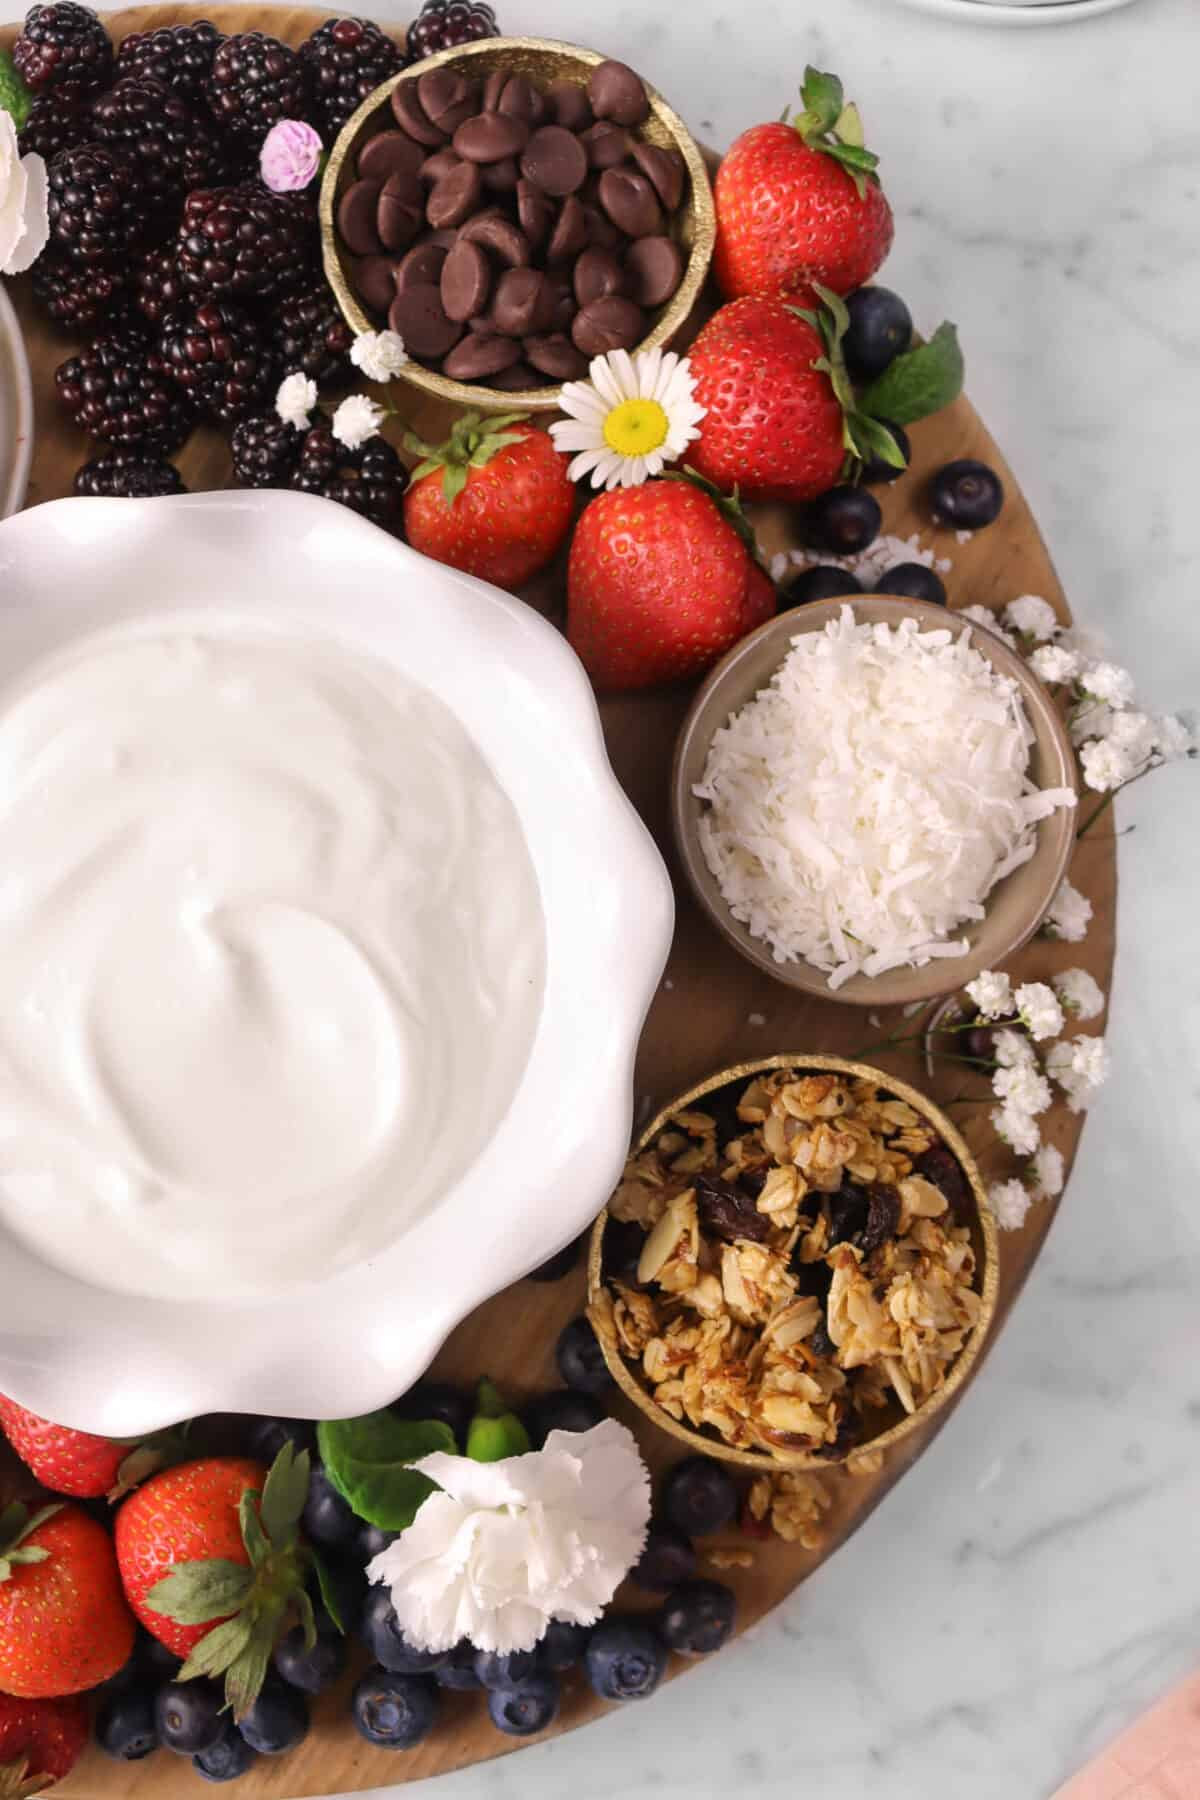 yogurt, berries, granola, coconut, and chocolate on a board